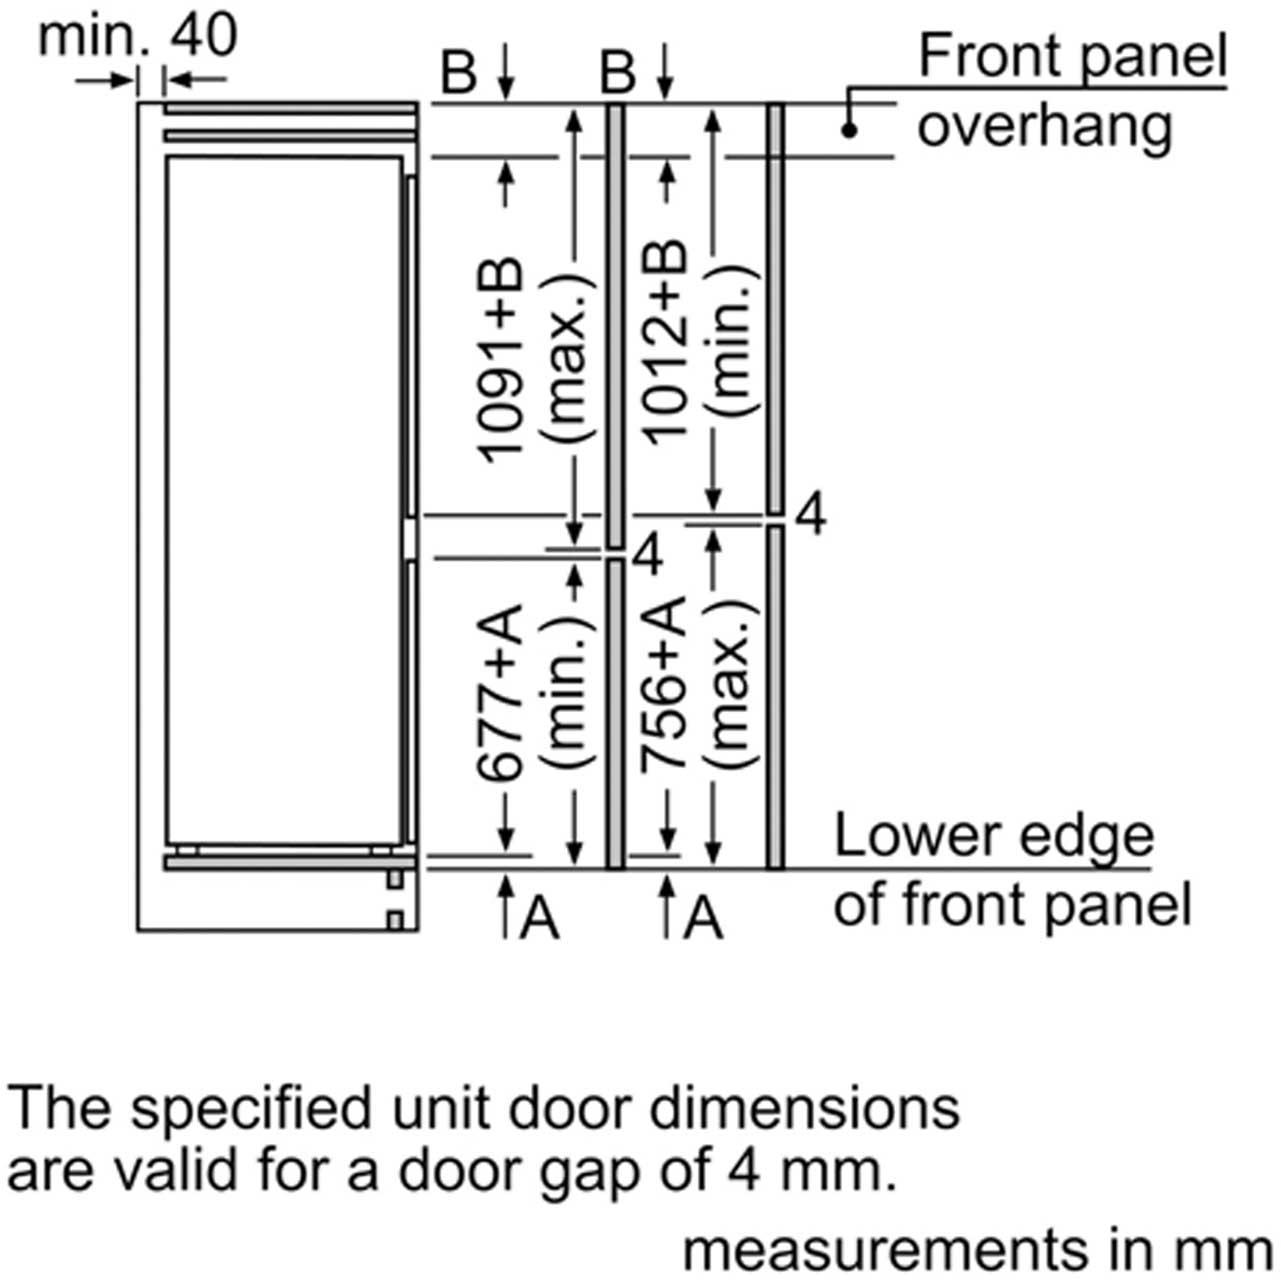 Ki5862s30g Wh Neff Fridge Freezer Freshsense Refrigerator Door Alarm Circuit Diagram